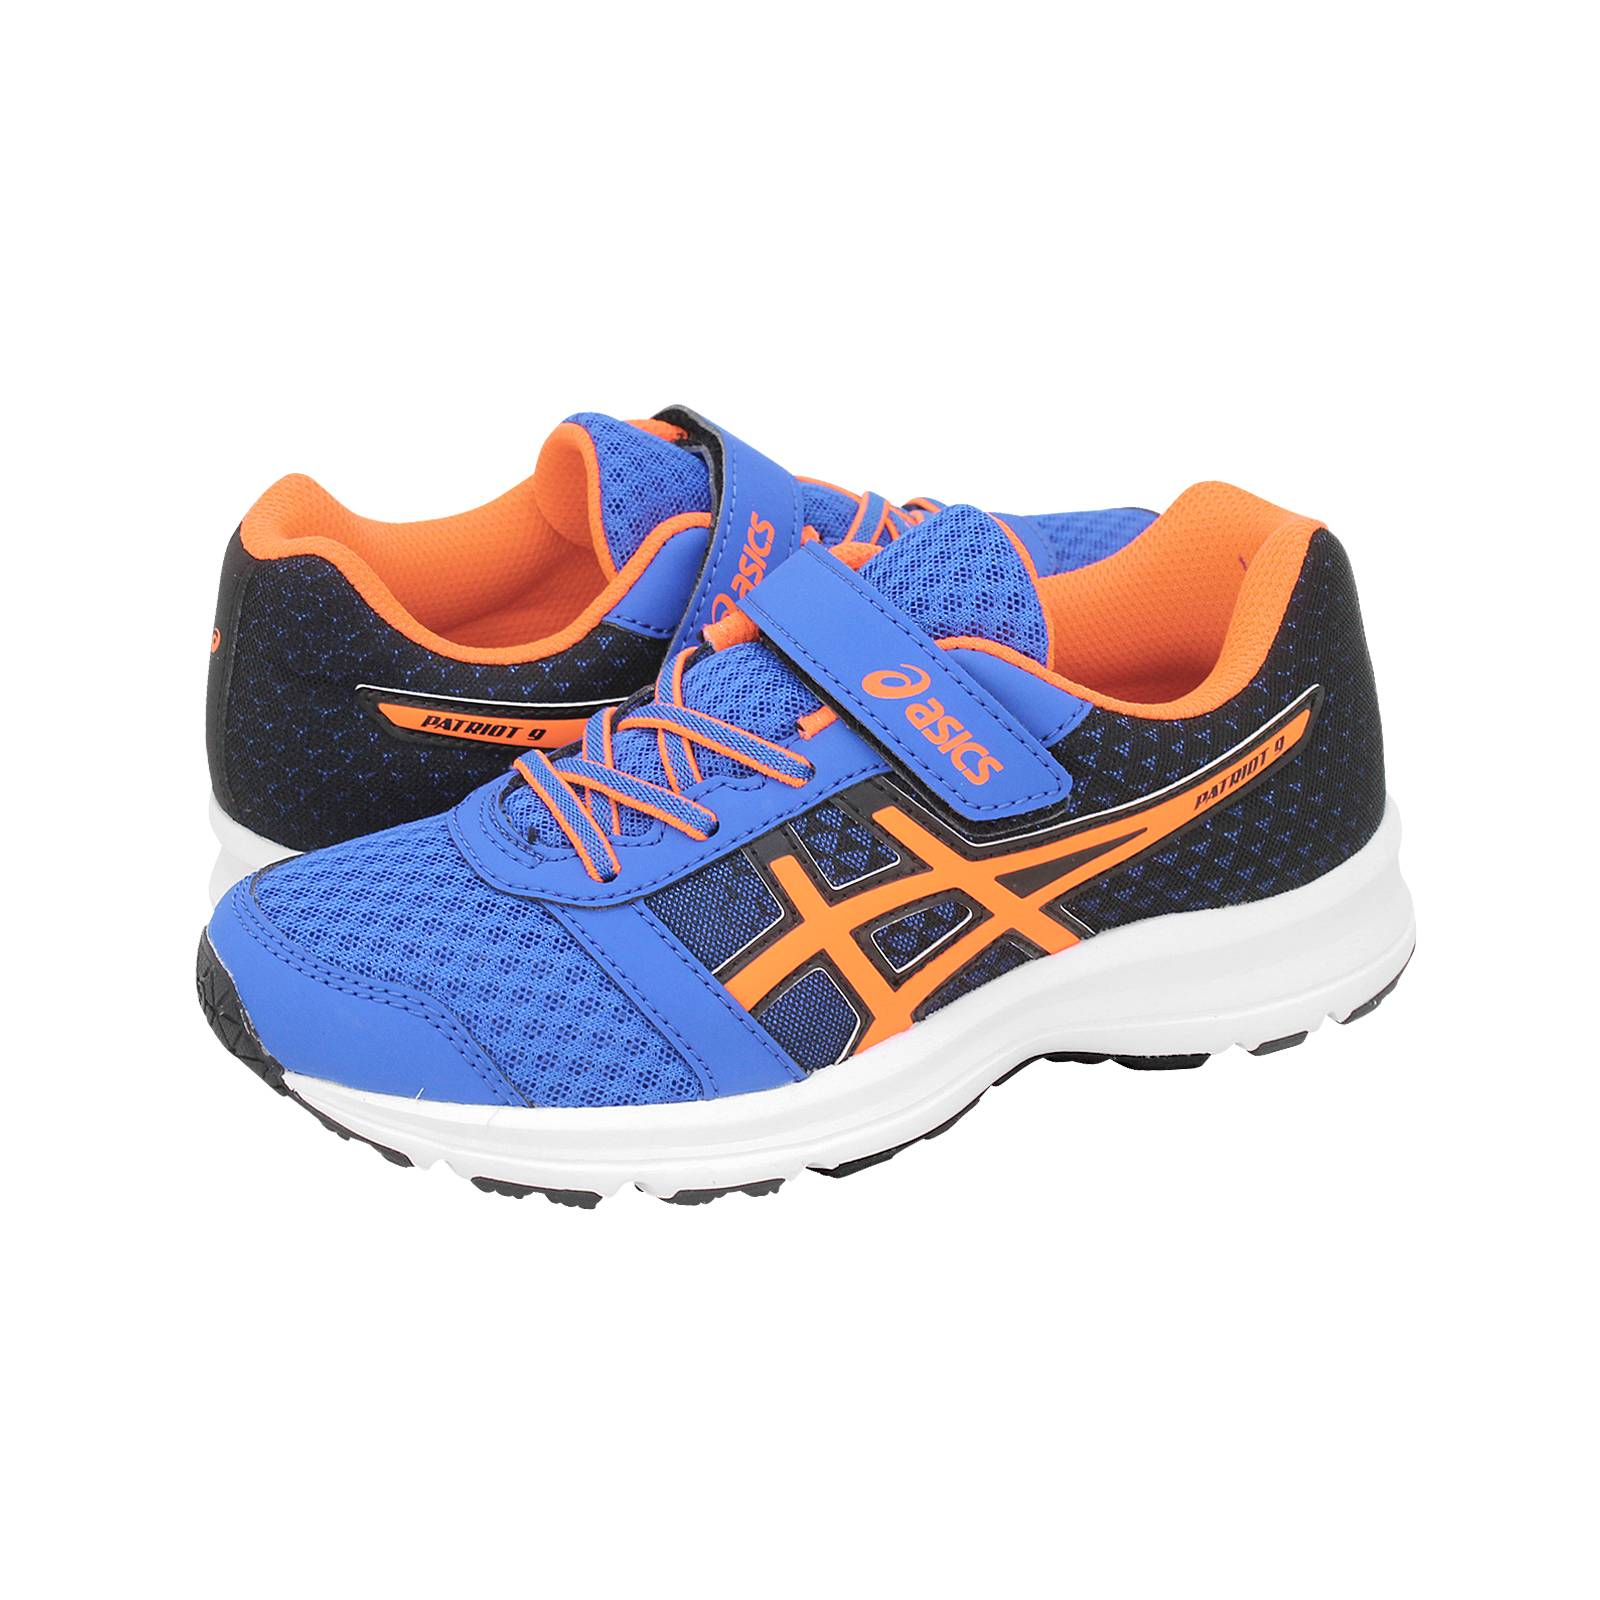 Patriot 9 - Asics Athletic kids' shoes